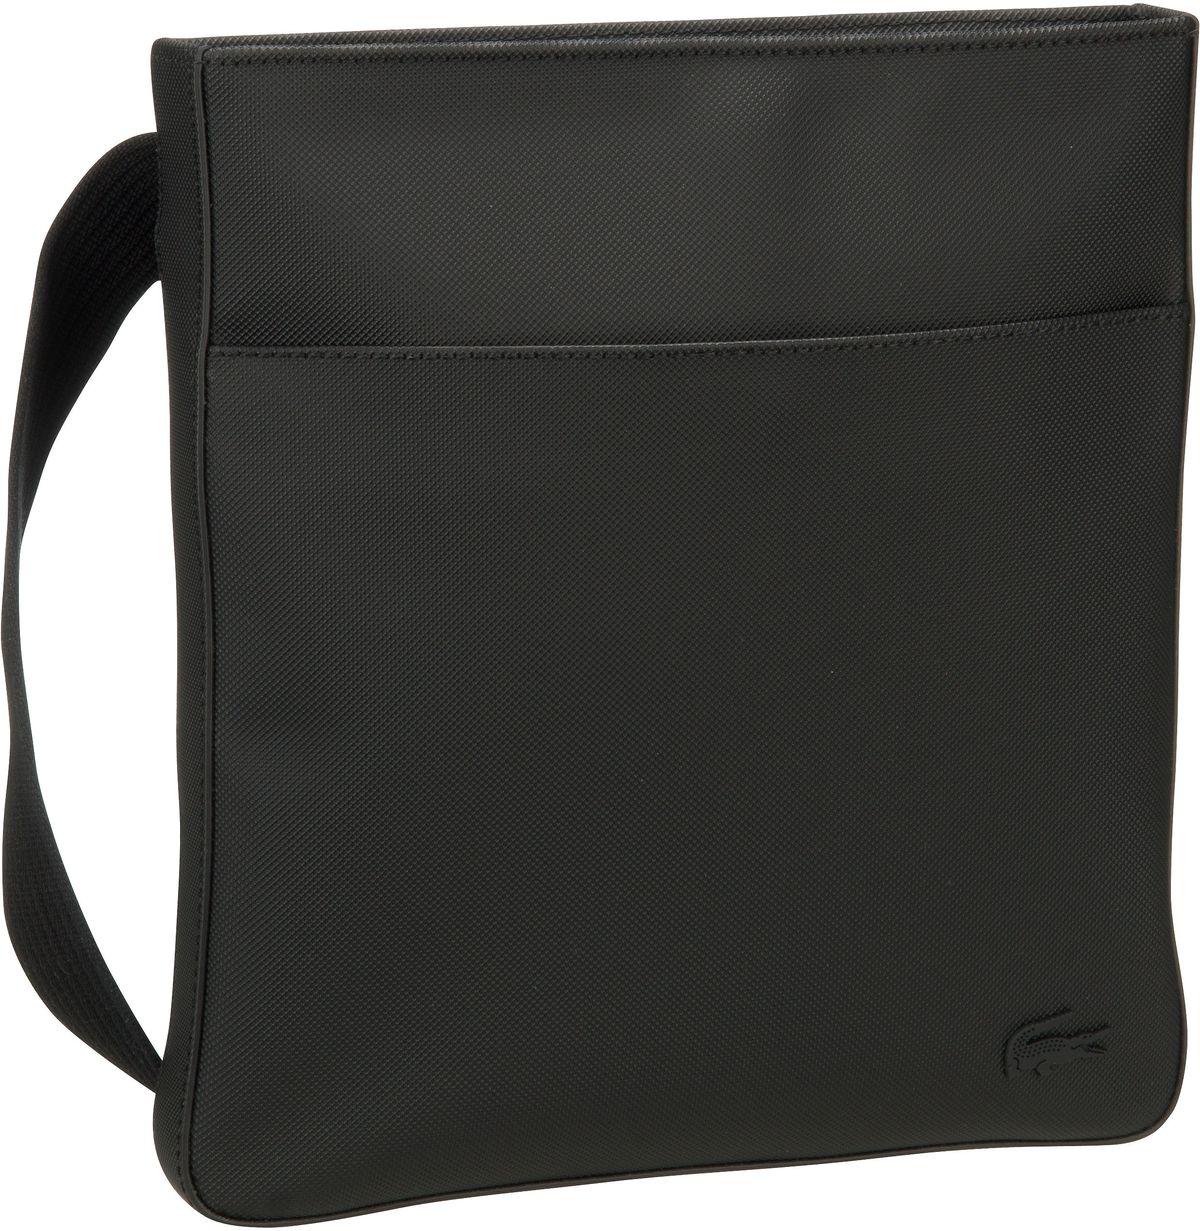 Umhängetasche Men's Classic Crossover Bag 2850 Black